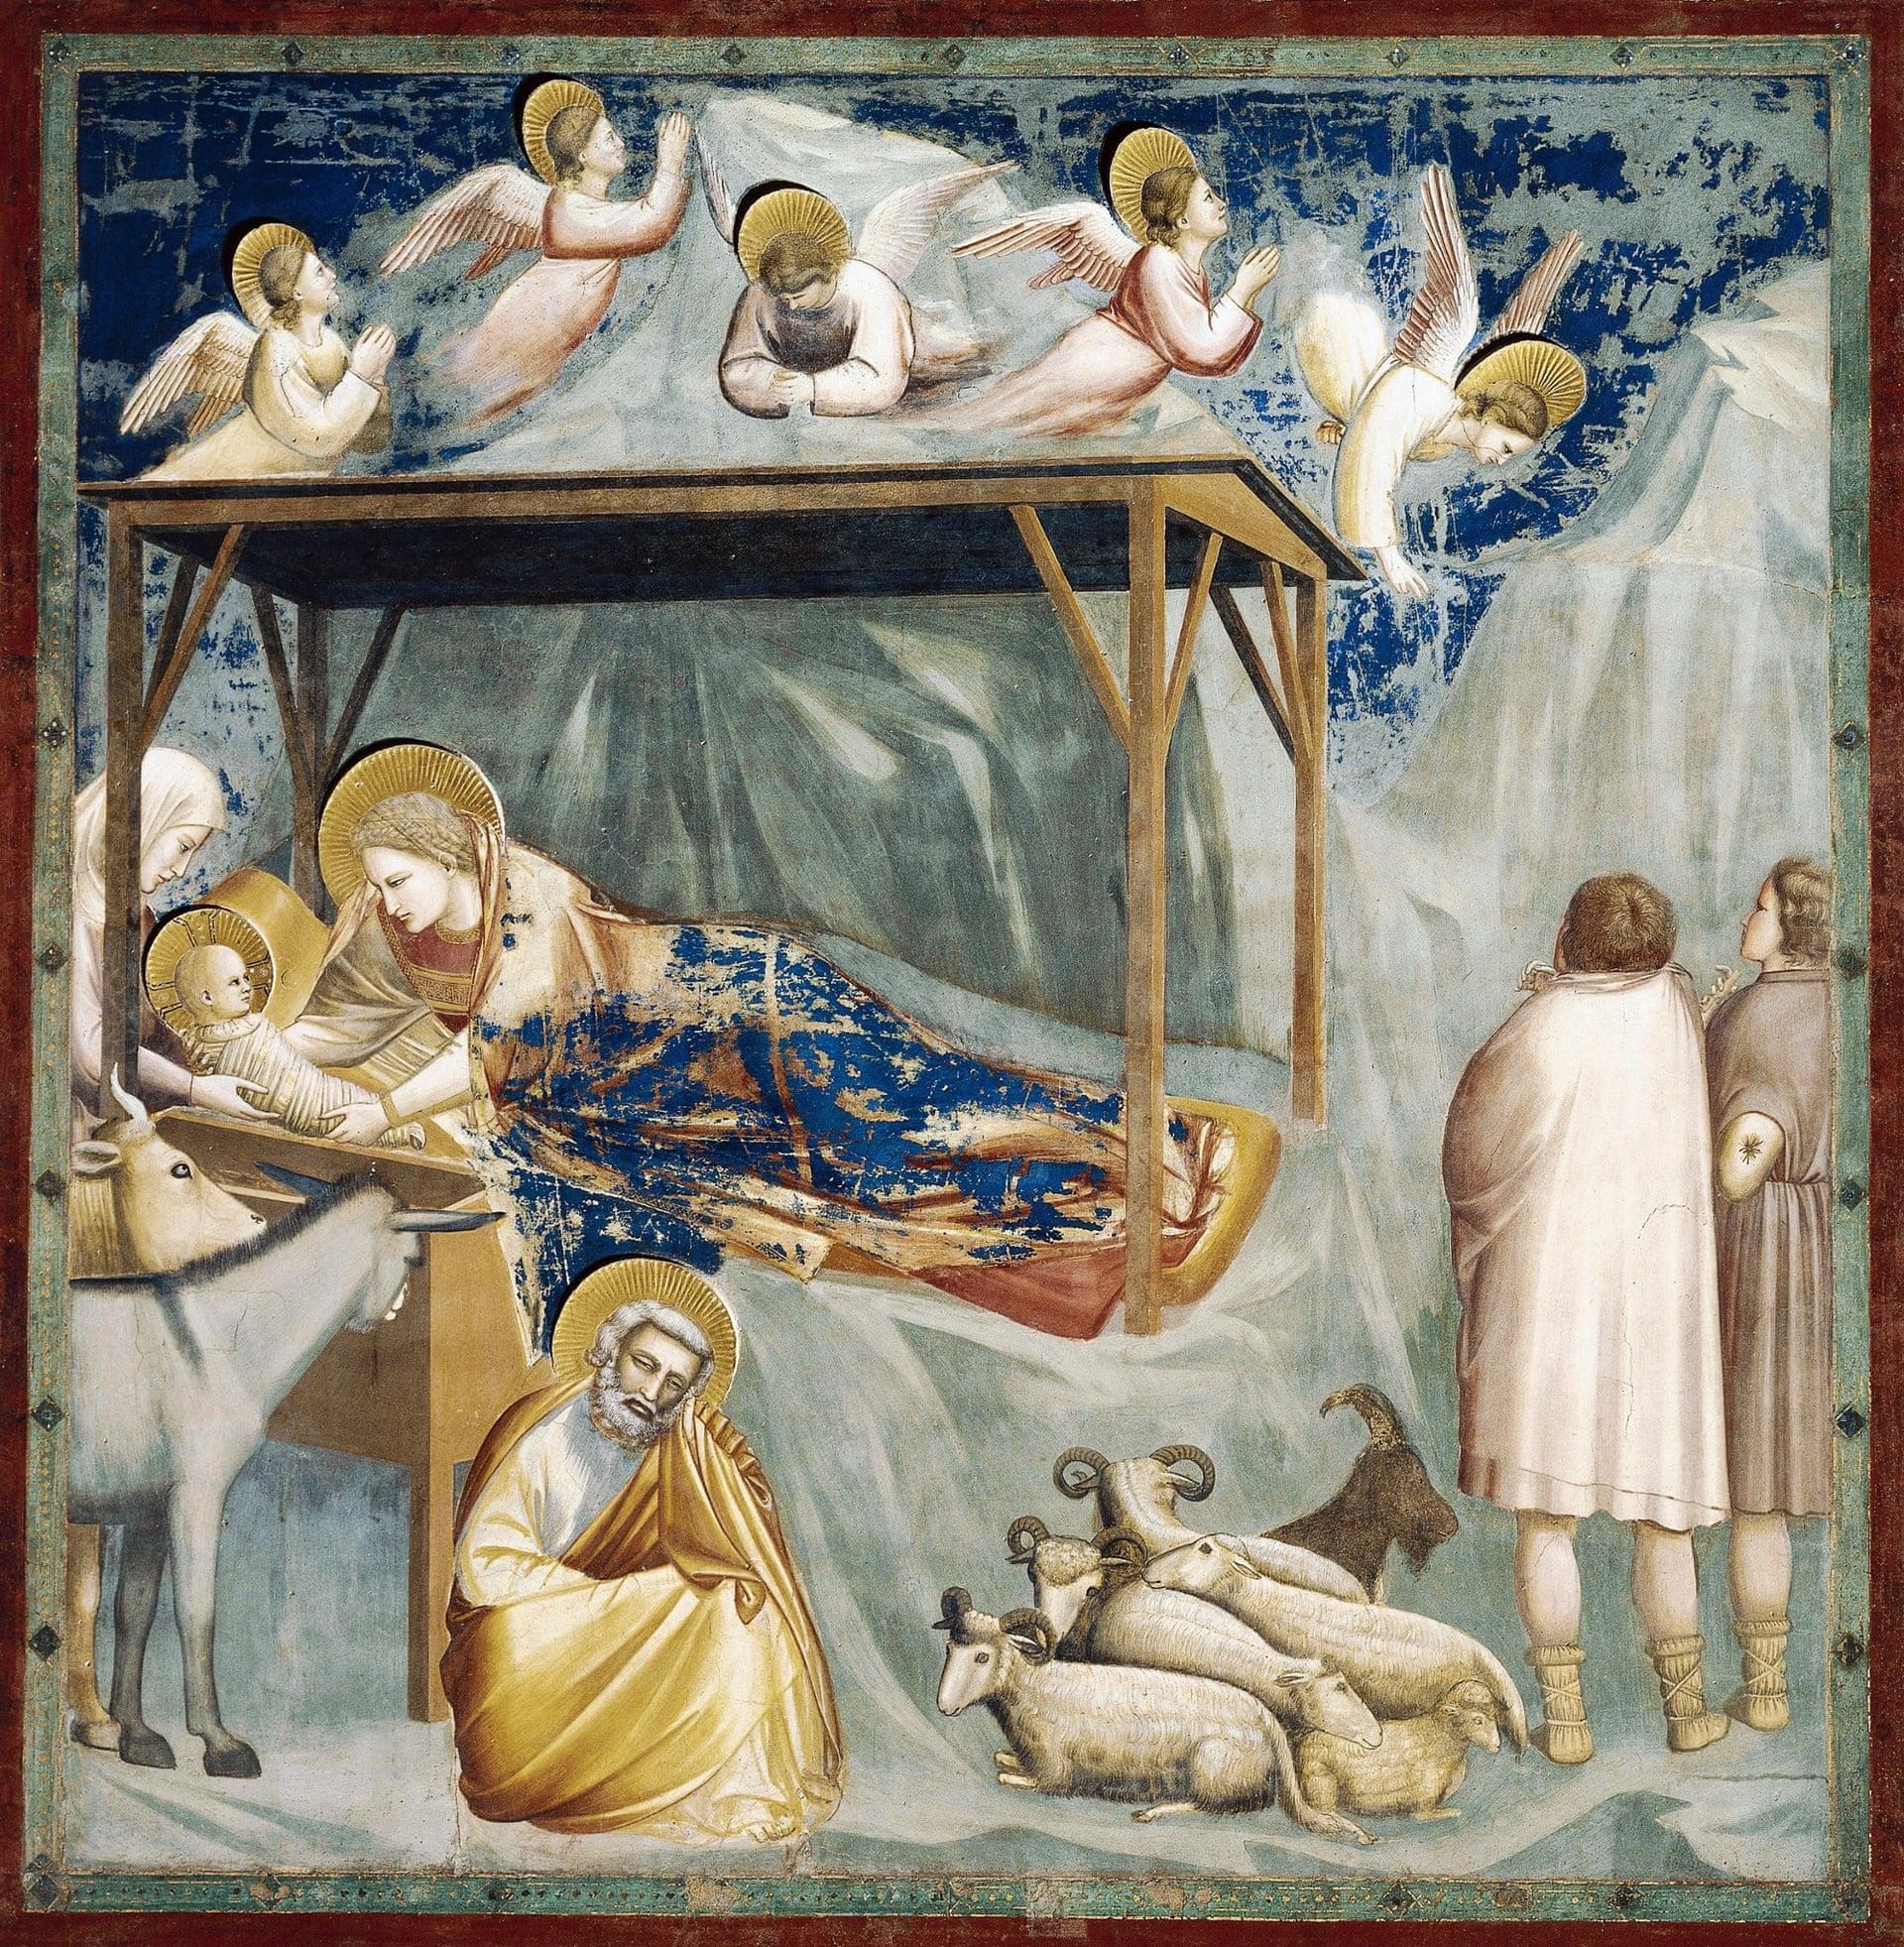 Nasterea, Giotto (1303-05)